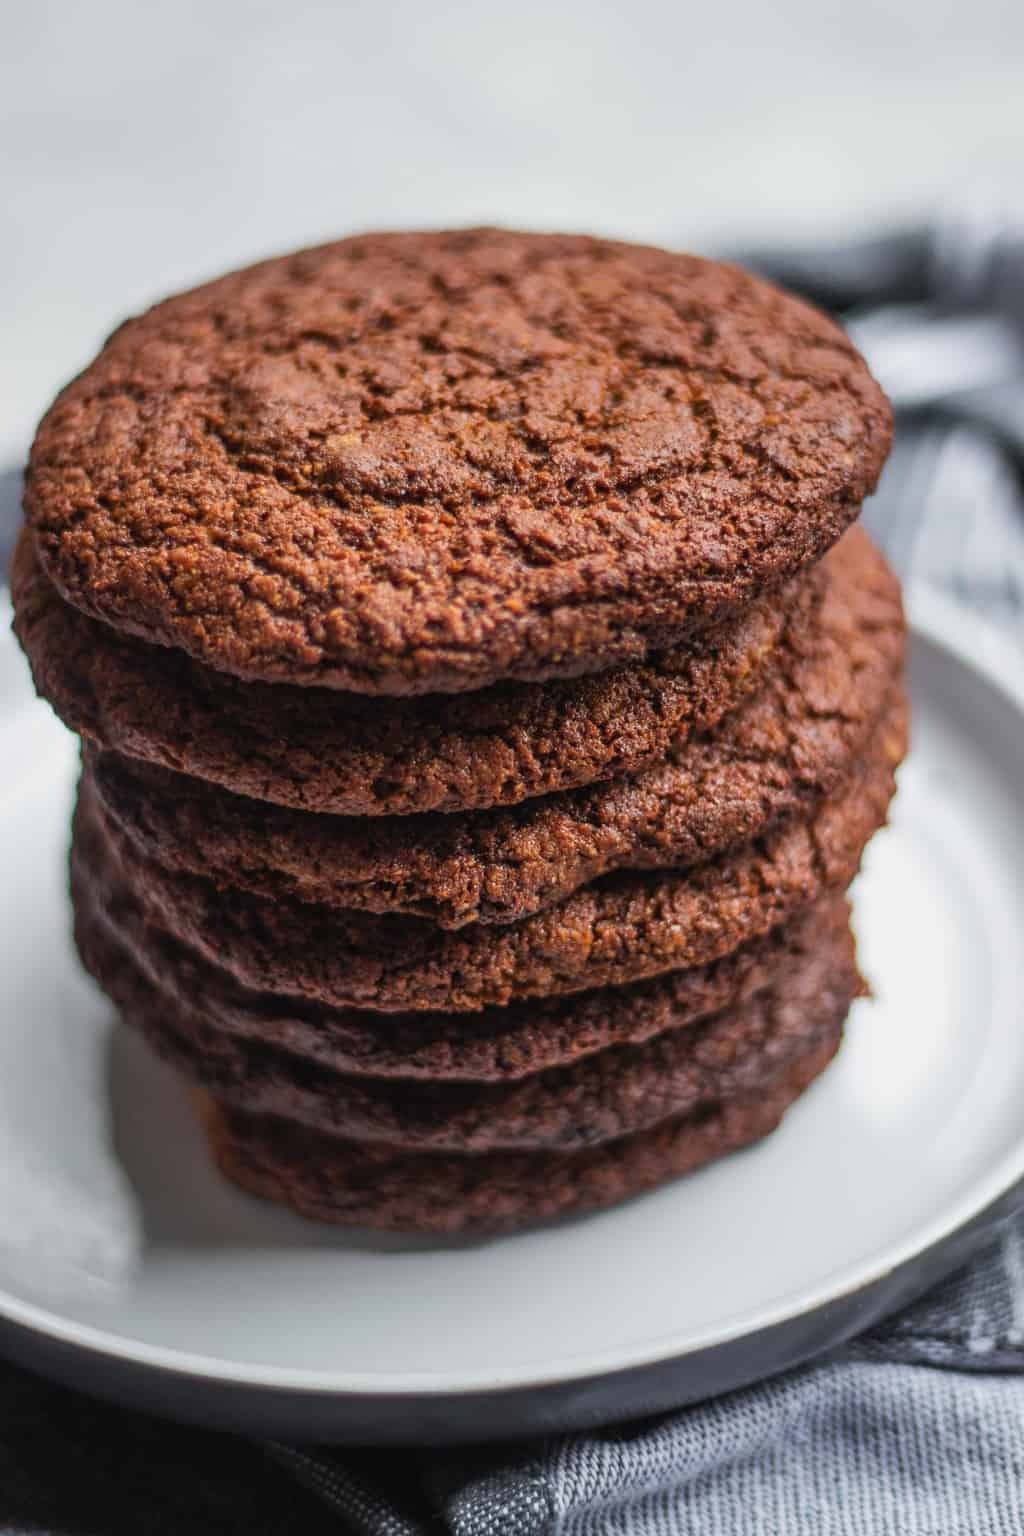 Vegan peanut butter cookies on a plate